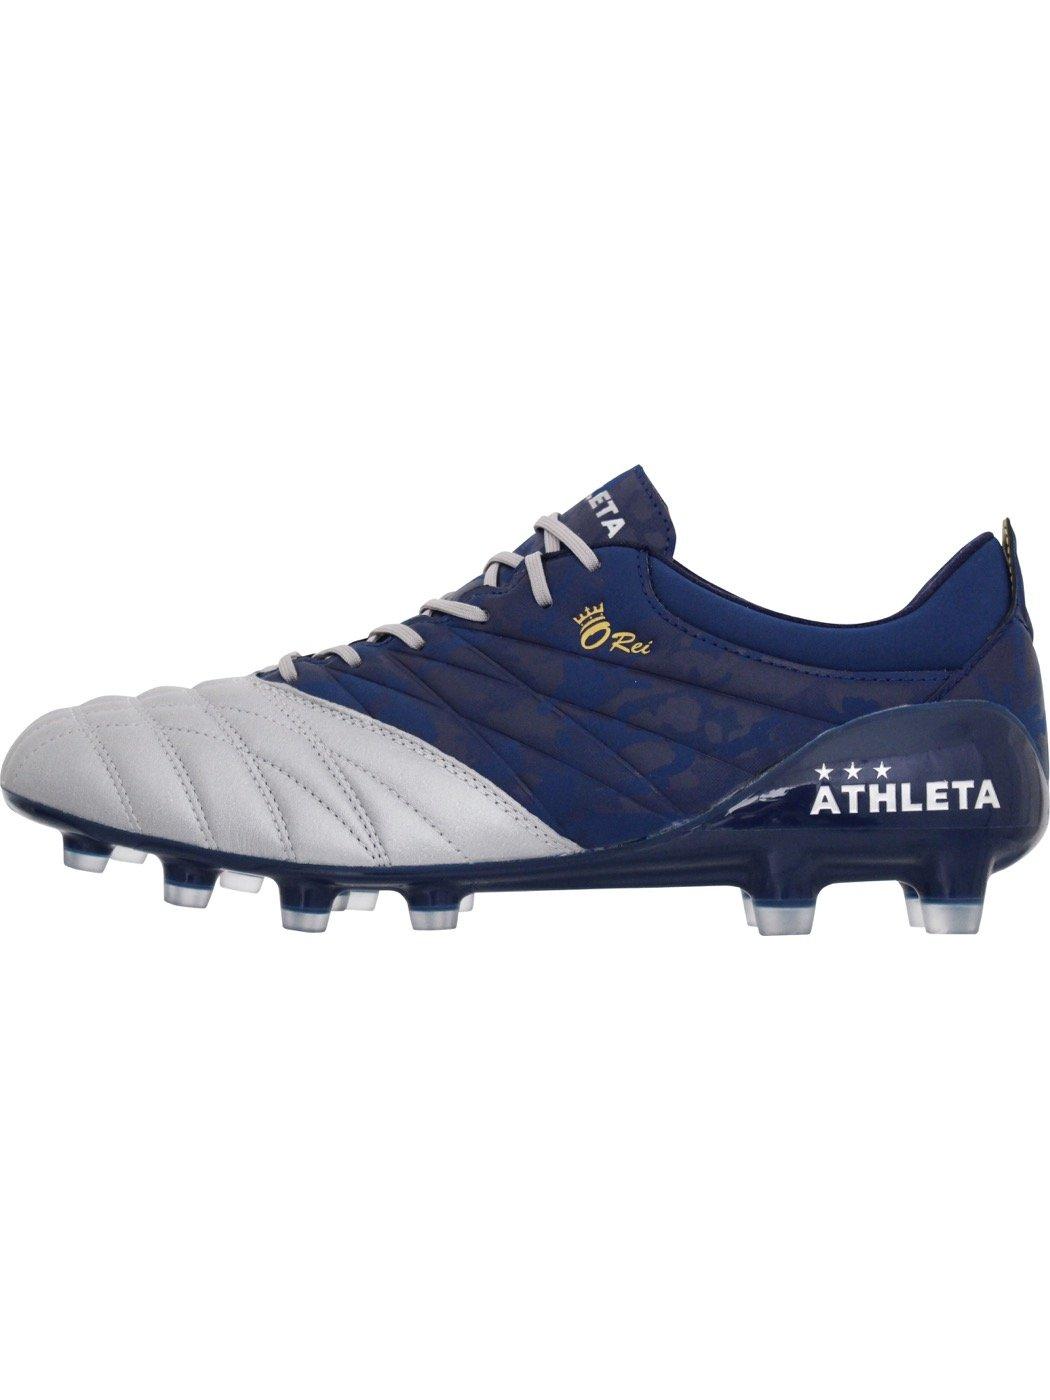 ATHLETA(アスレタ) O-Rei Futebol T001 10002-NVSI B01M0E7M7V9068 NVY/SIL 25.5